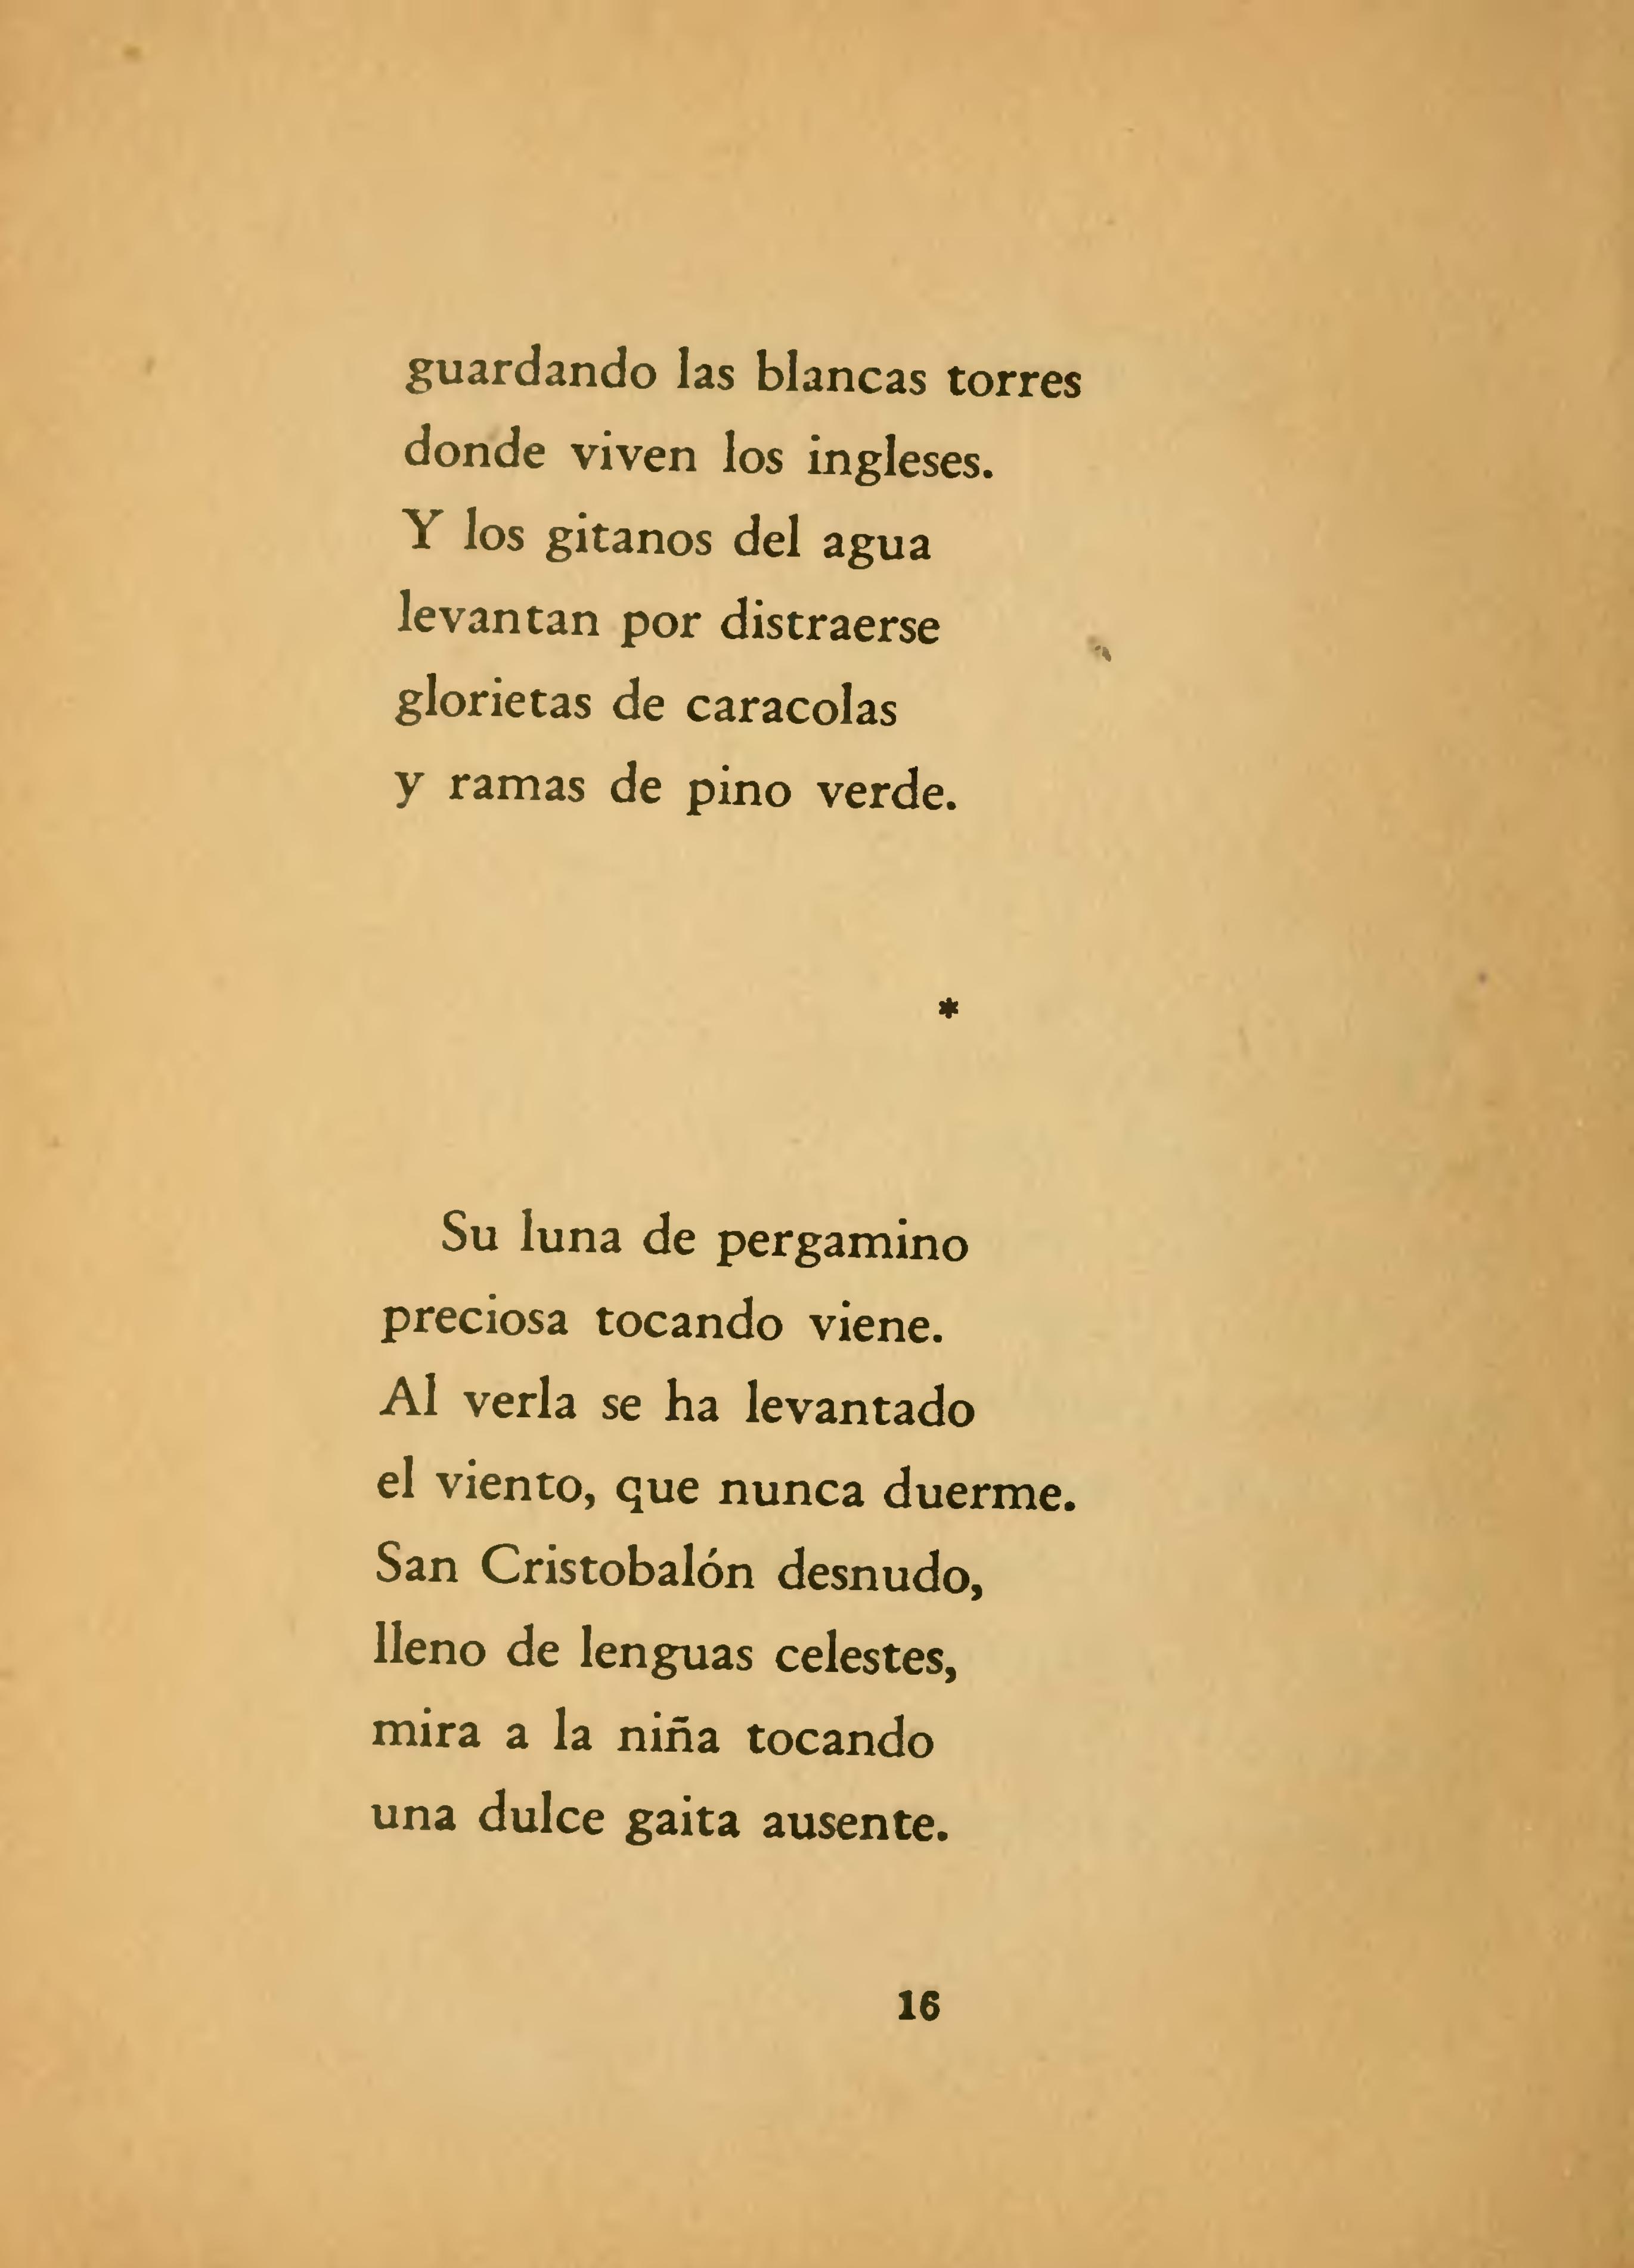 Poema al denudo - 1 8